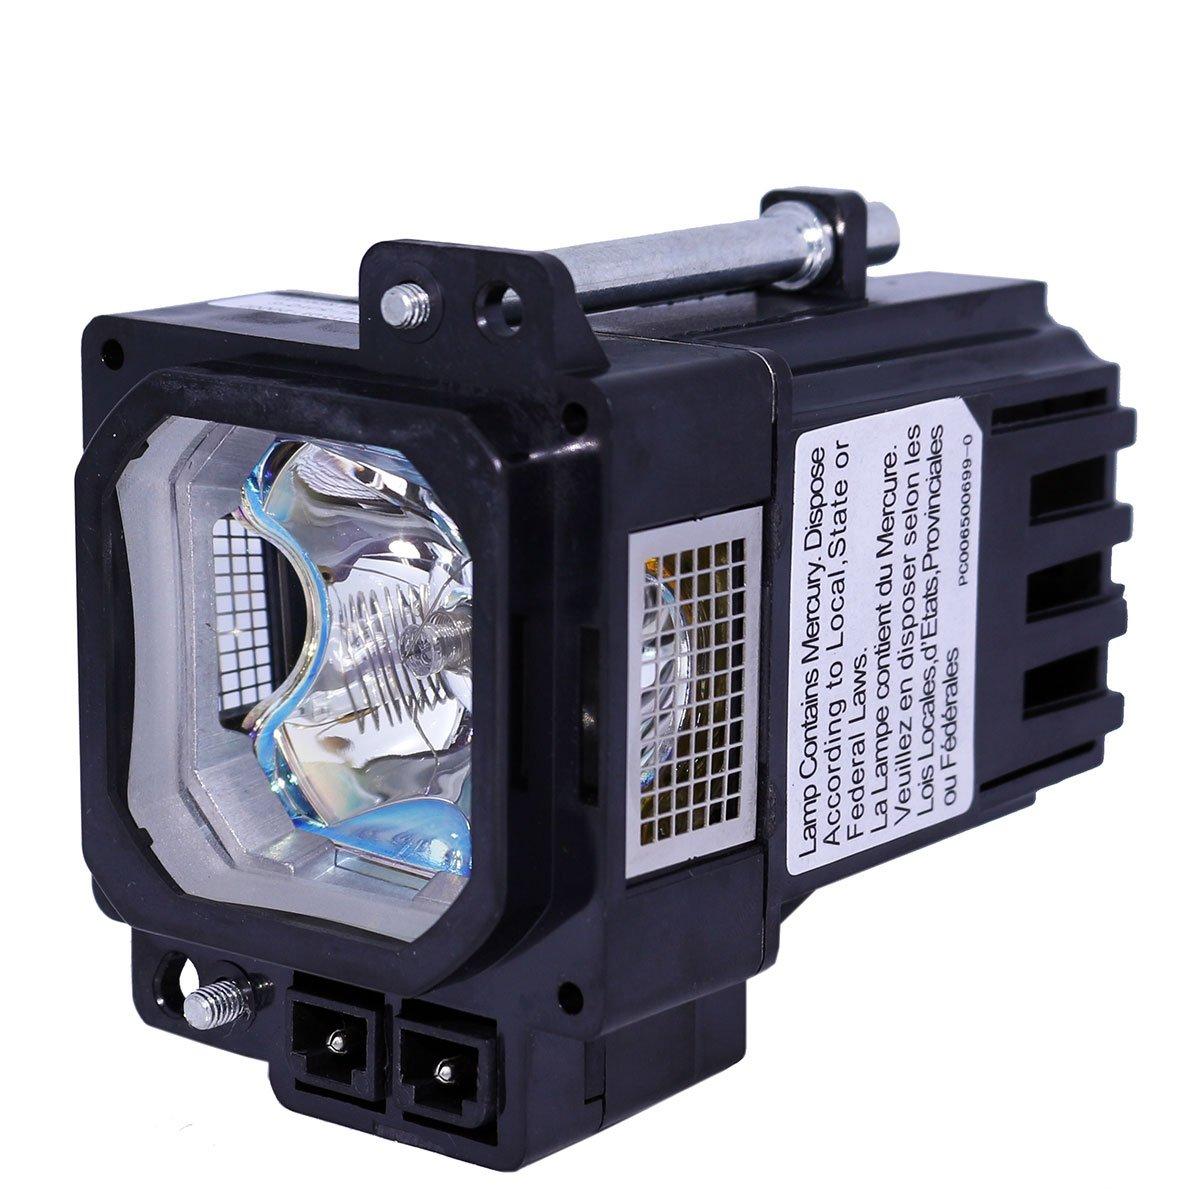 Lampara de Reemplazo con Carcasa AuraBeam Profesional para Proyector JVC BHL5010-S (accionado por Philips) PSABHPHI-JVC-BHL5010-S